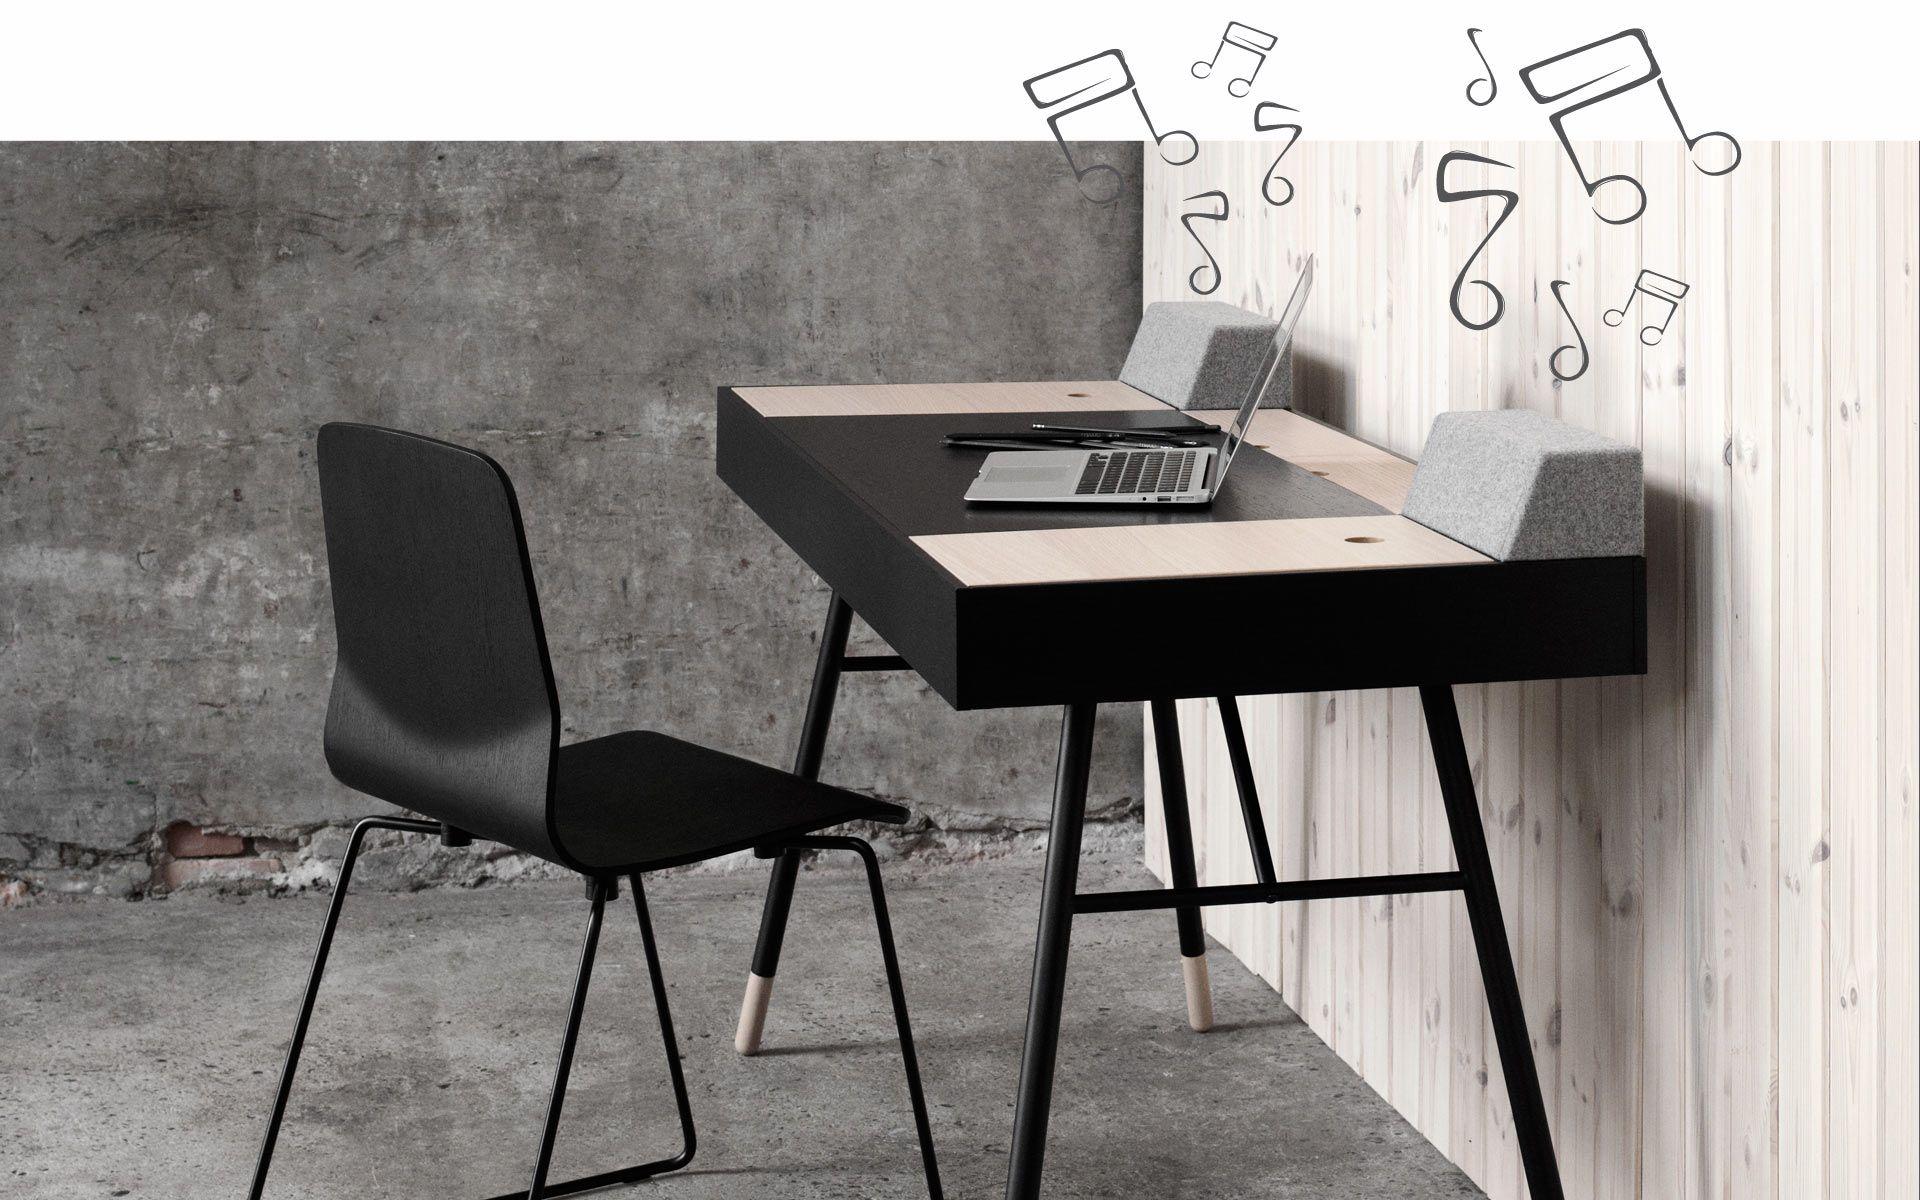 new collection boconcept boconcept collection 2014 2015 pinterest mobilier de salon. Black Bedroom Furniture Sets. Home Design Ideas